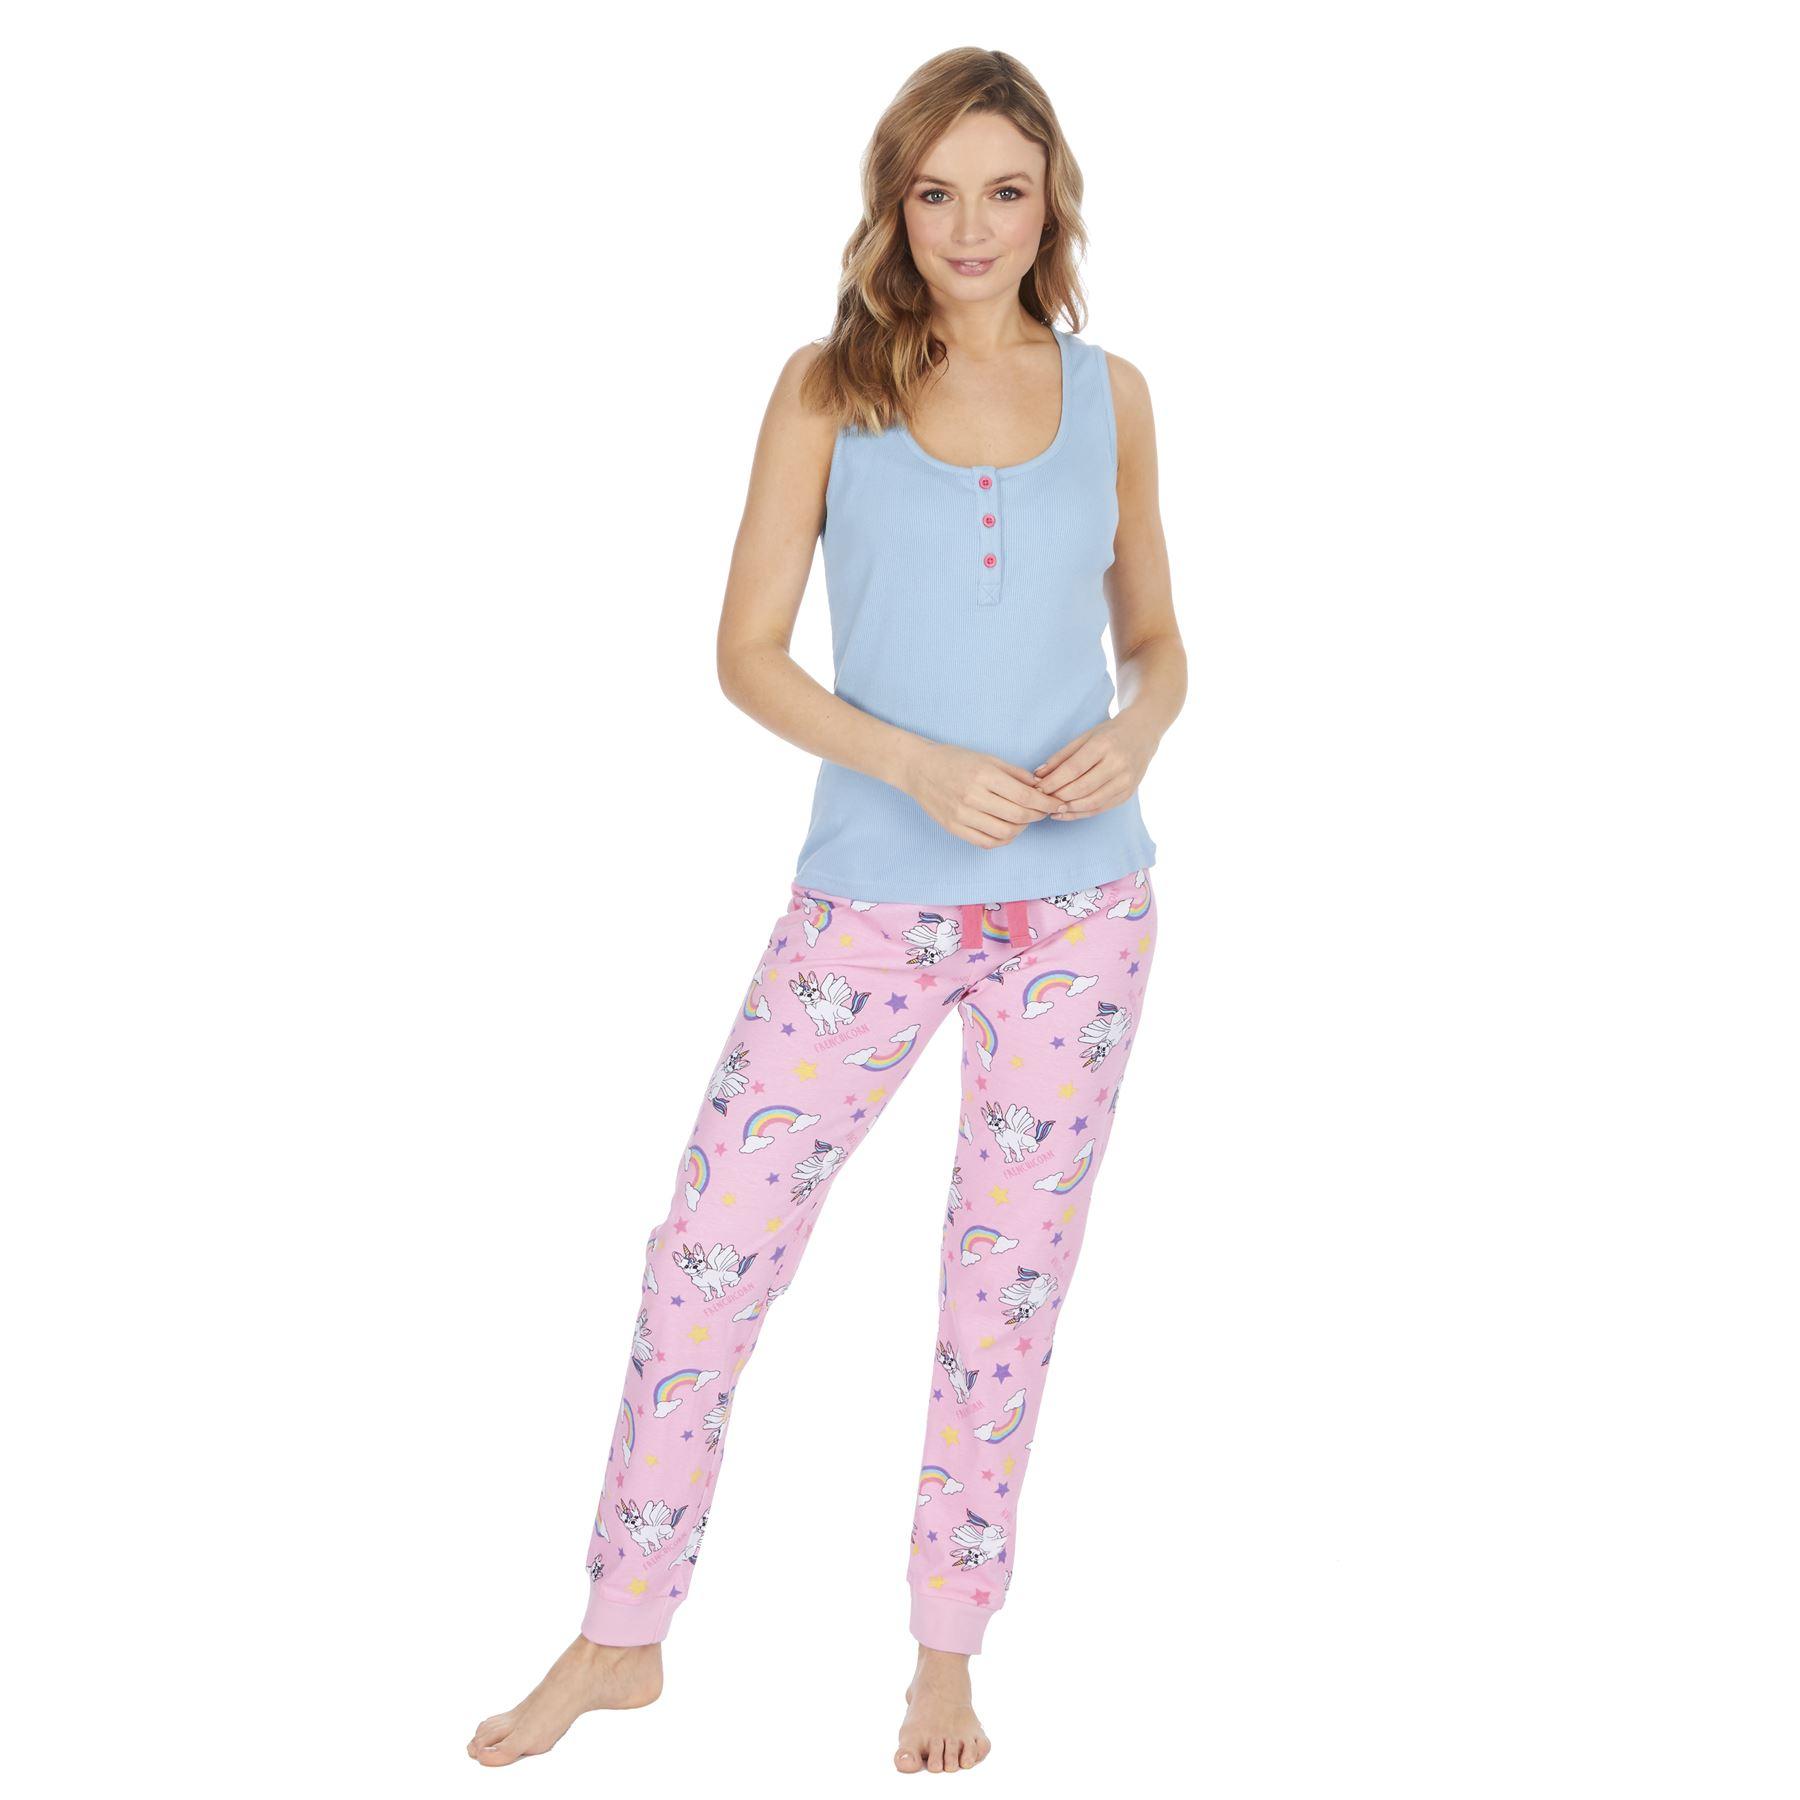 Womens-Ladies-Cotton-Pyjamas-Pyjama-PJs-Summer-Nightwear-Set-Size-8-18-NEW thumbnail 7